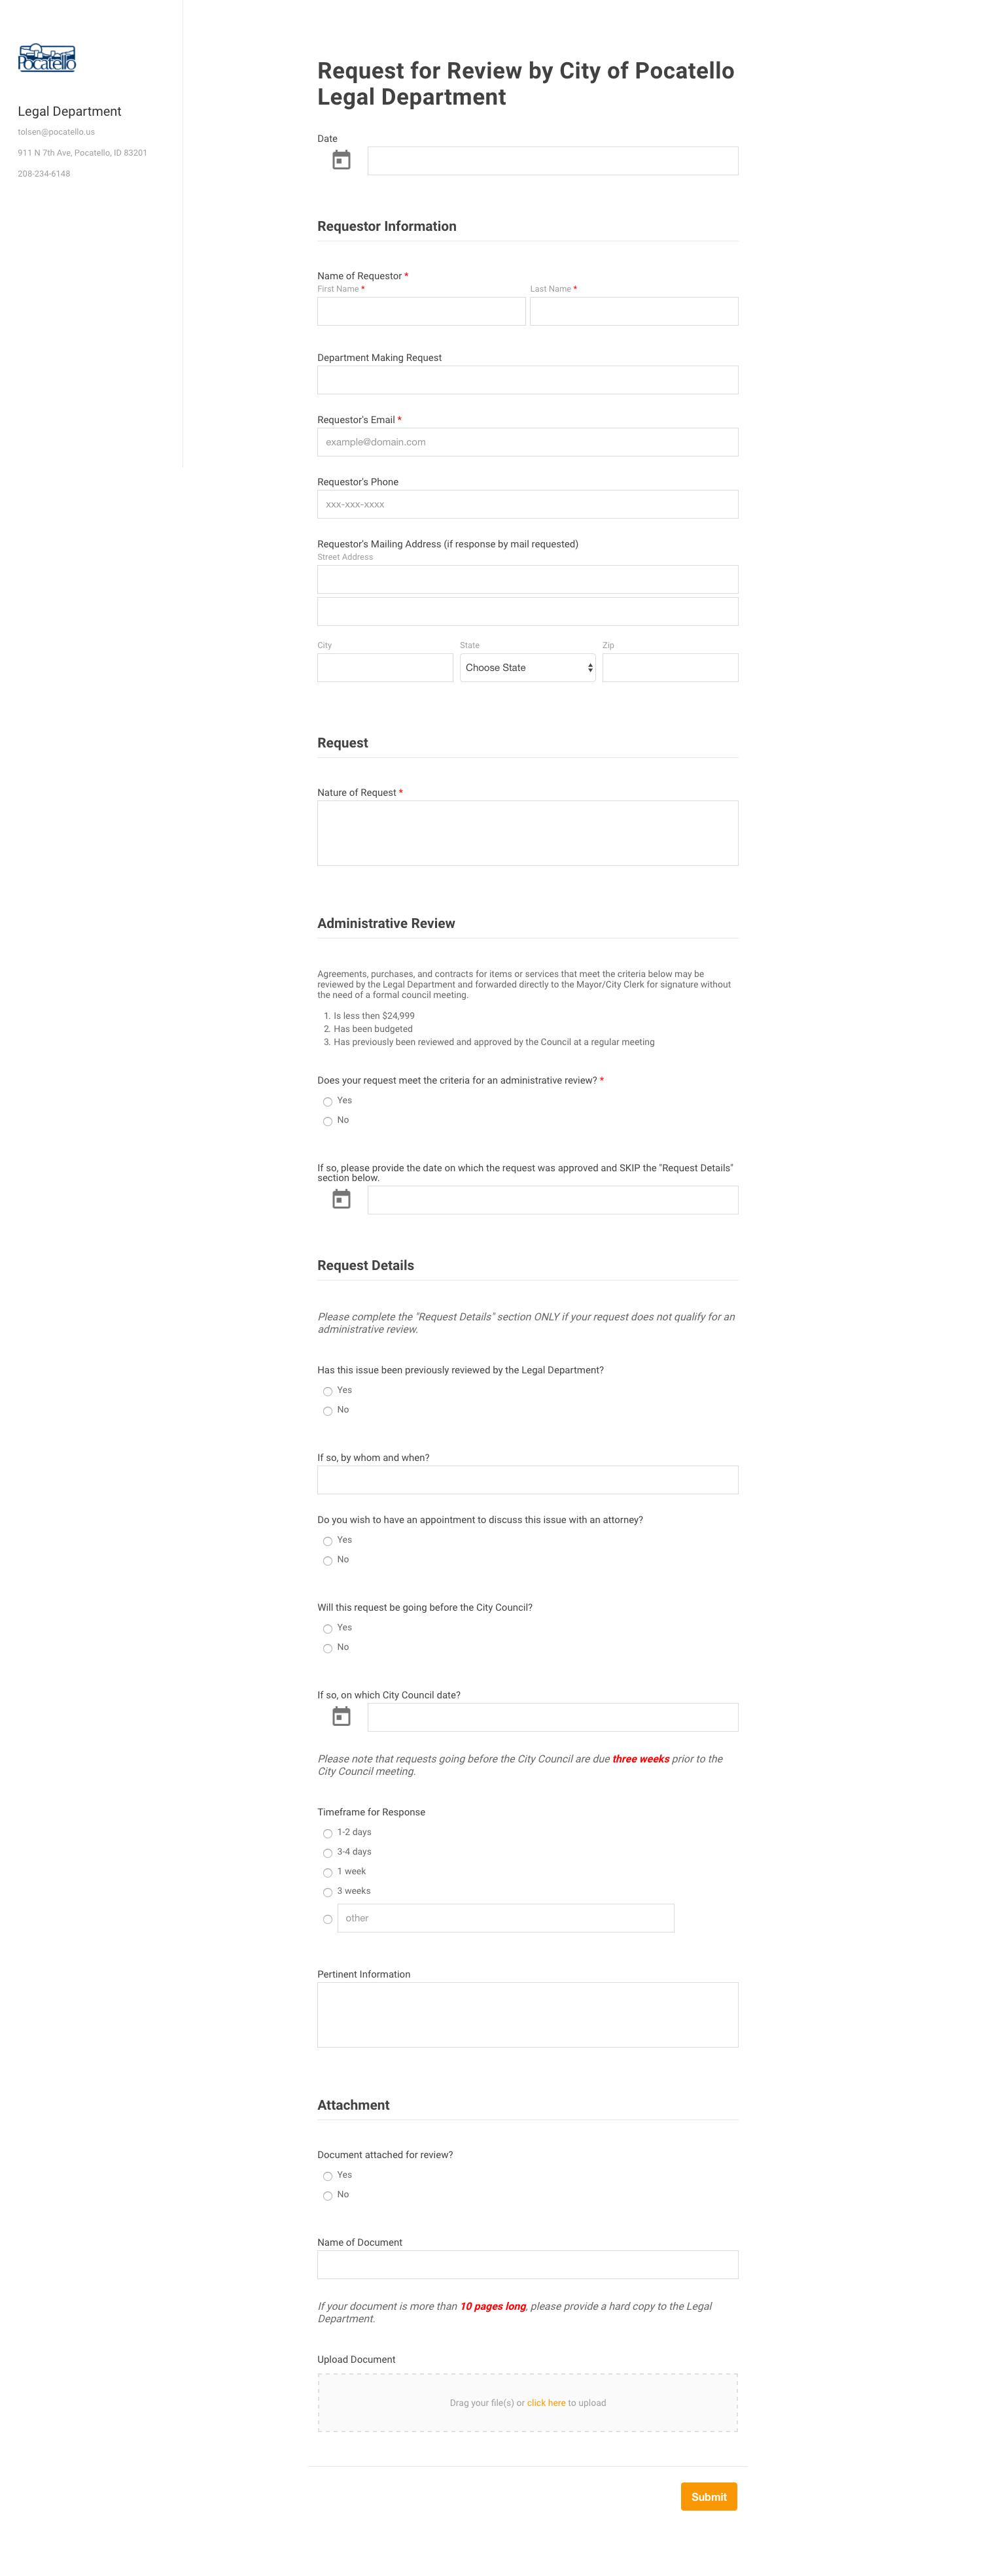 Form Examples SeamlessGov Blog - Idaho legal forms